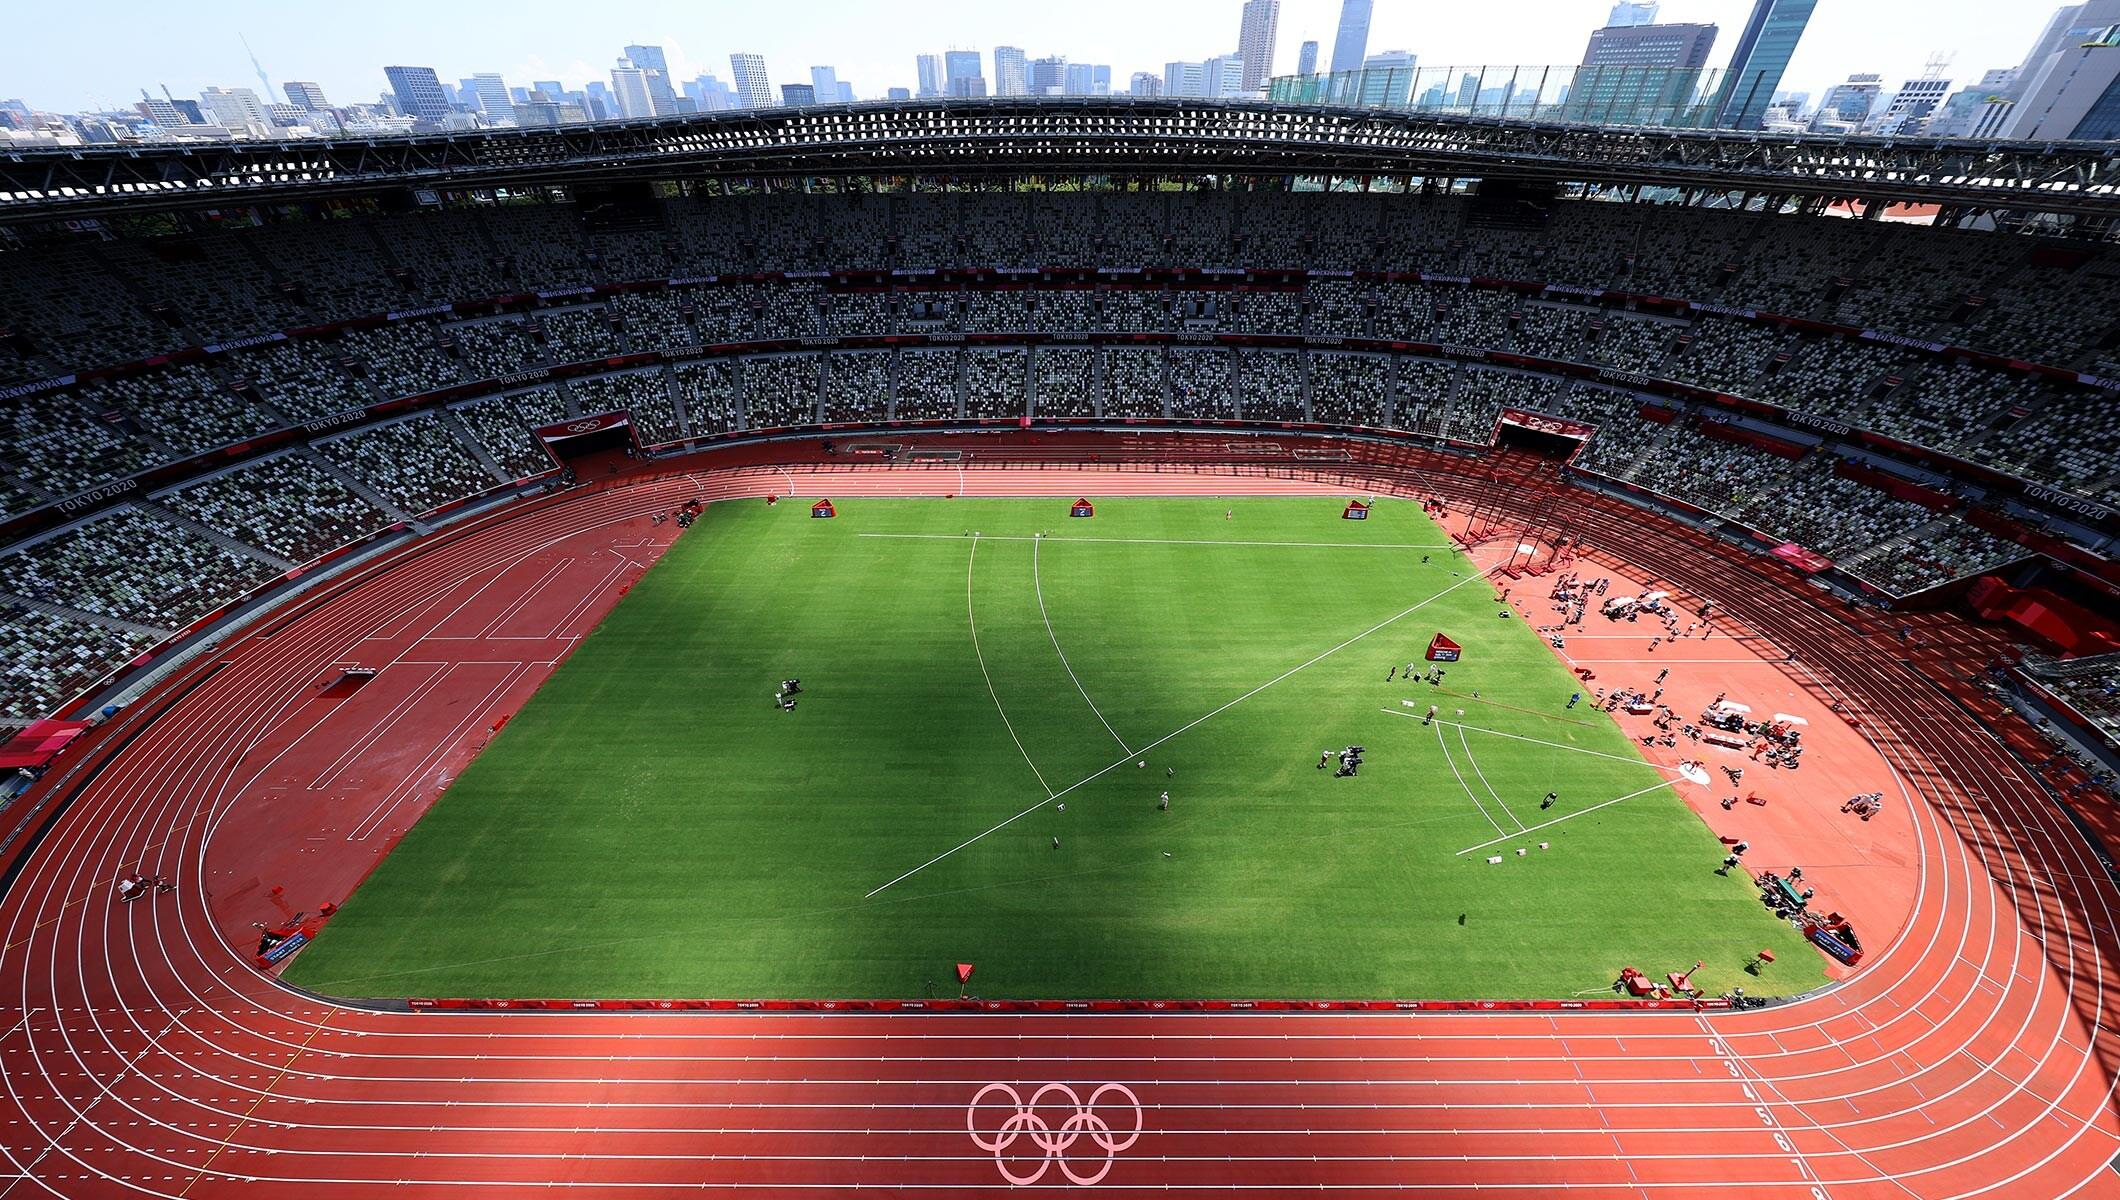 Tokyo Olympic Stadium 2020 aerial shot